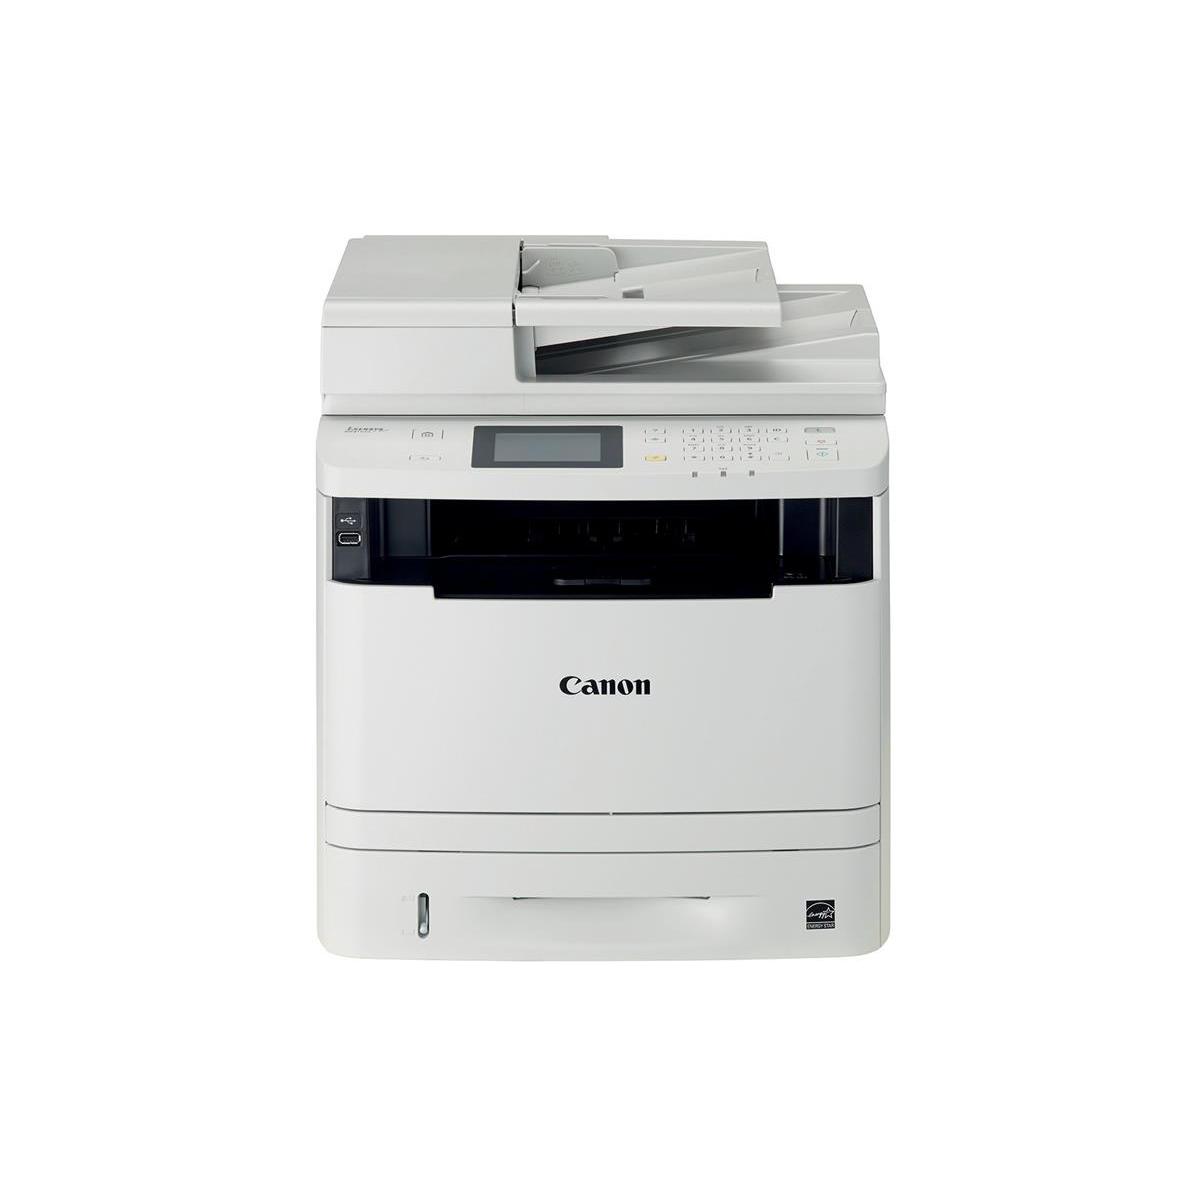 G000065